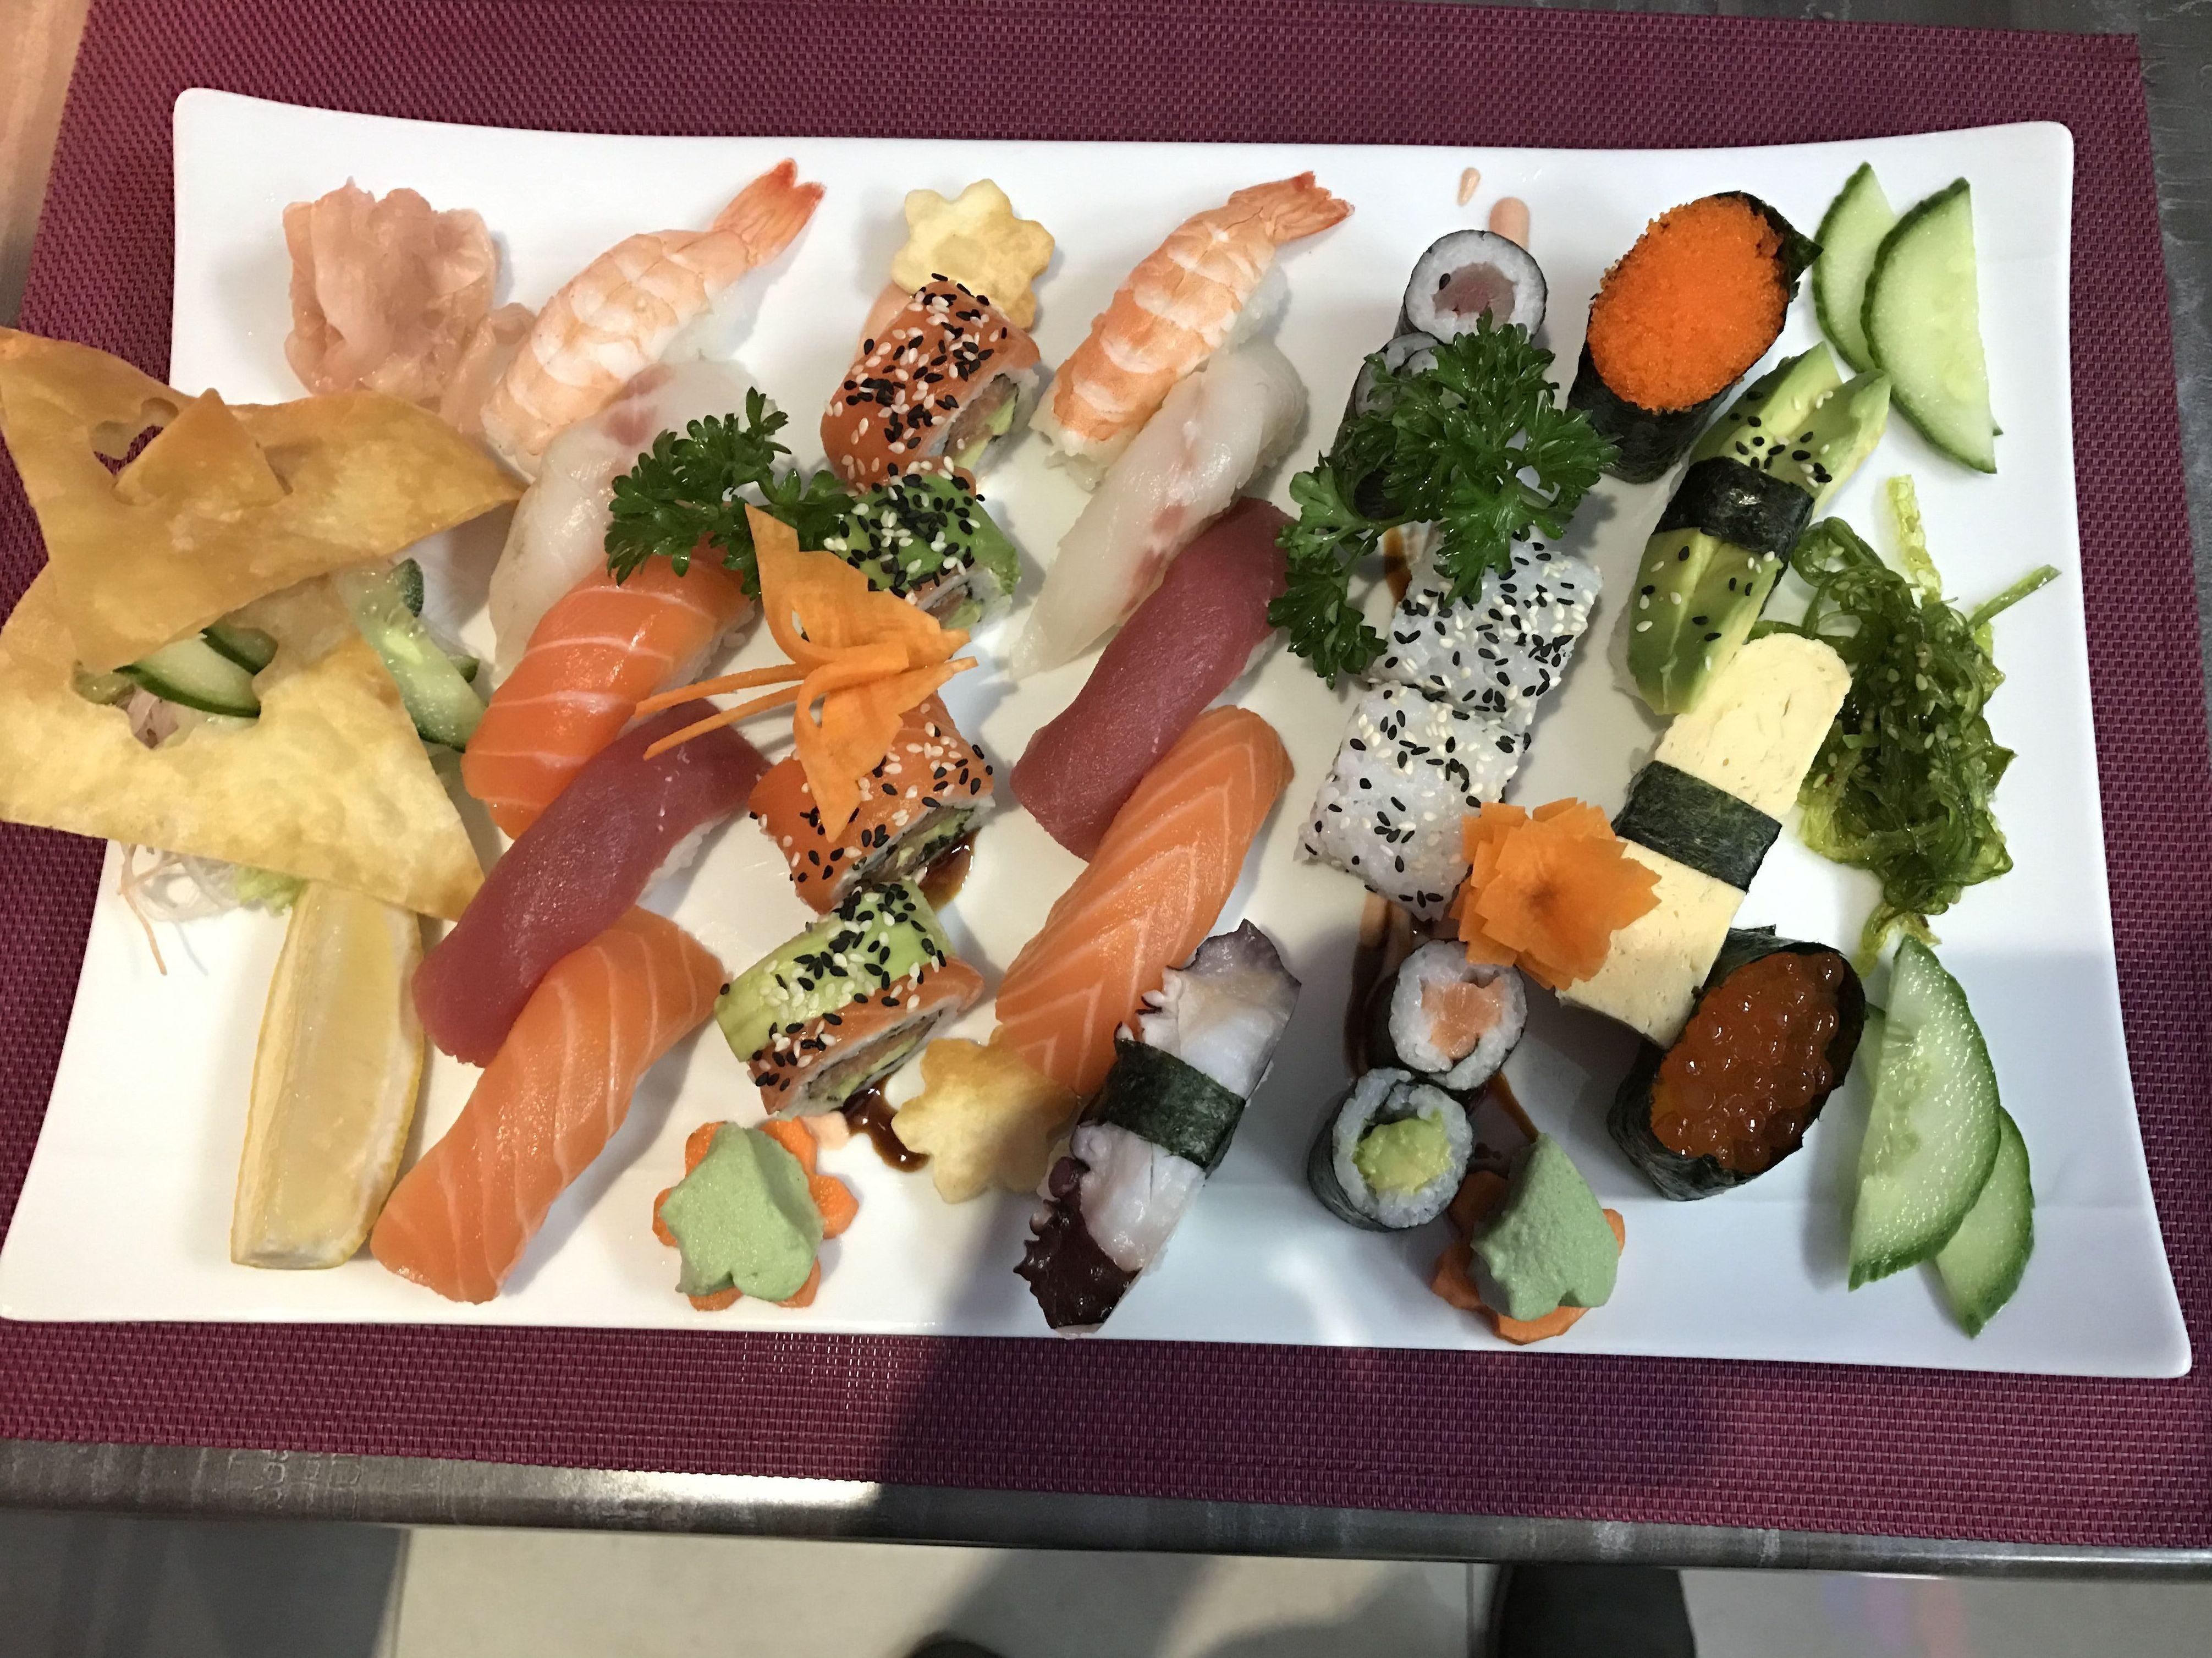 Foto 5 de Restaurante de comida fusión en San Bartolomé de Tirajana | Restaurante SushiMex